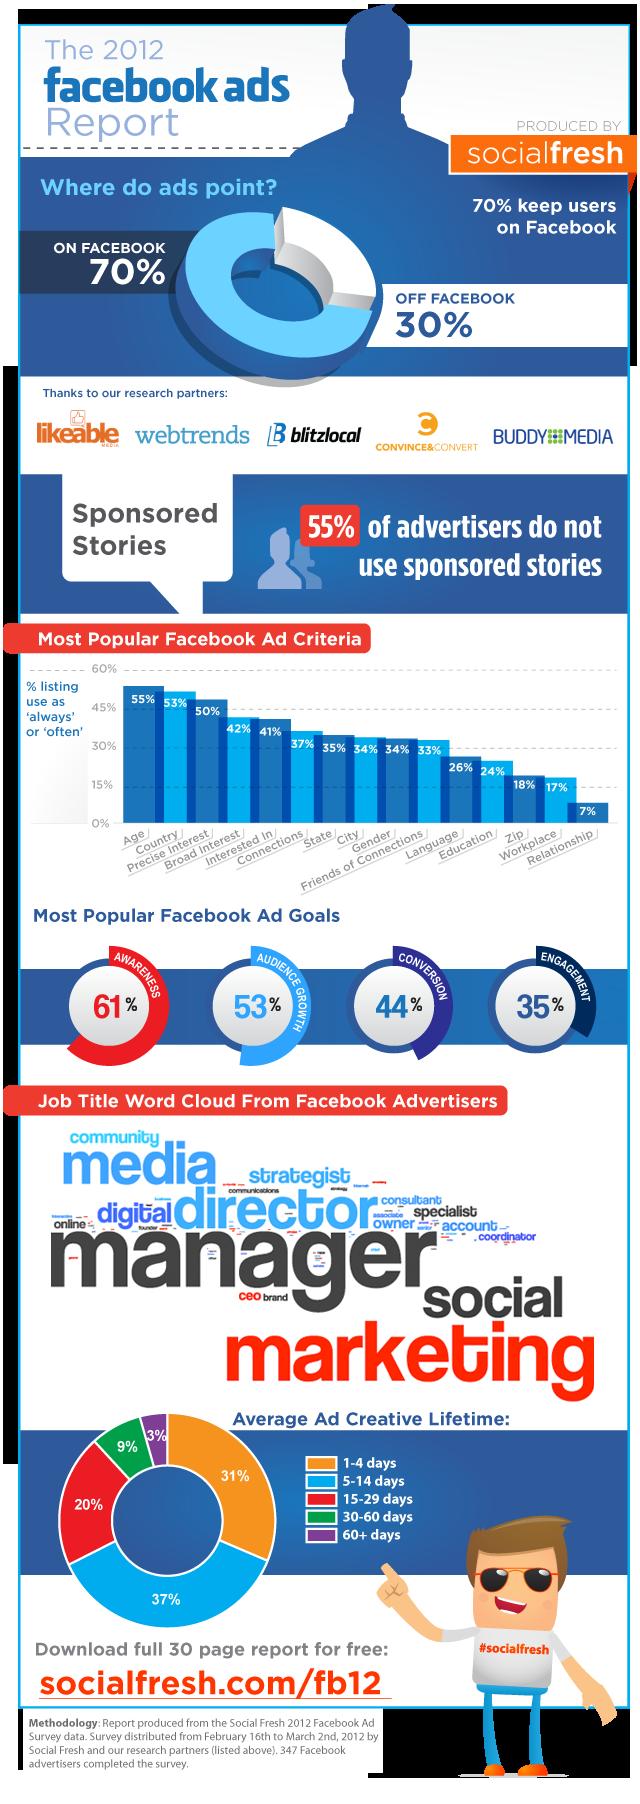 Facebook Ads Report - Criterios de Marketing, Timelife y Goals - ¡I Love You, Infographic!